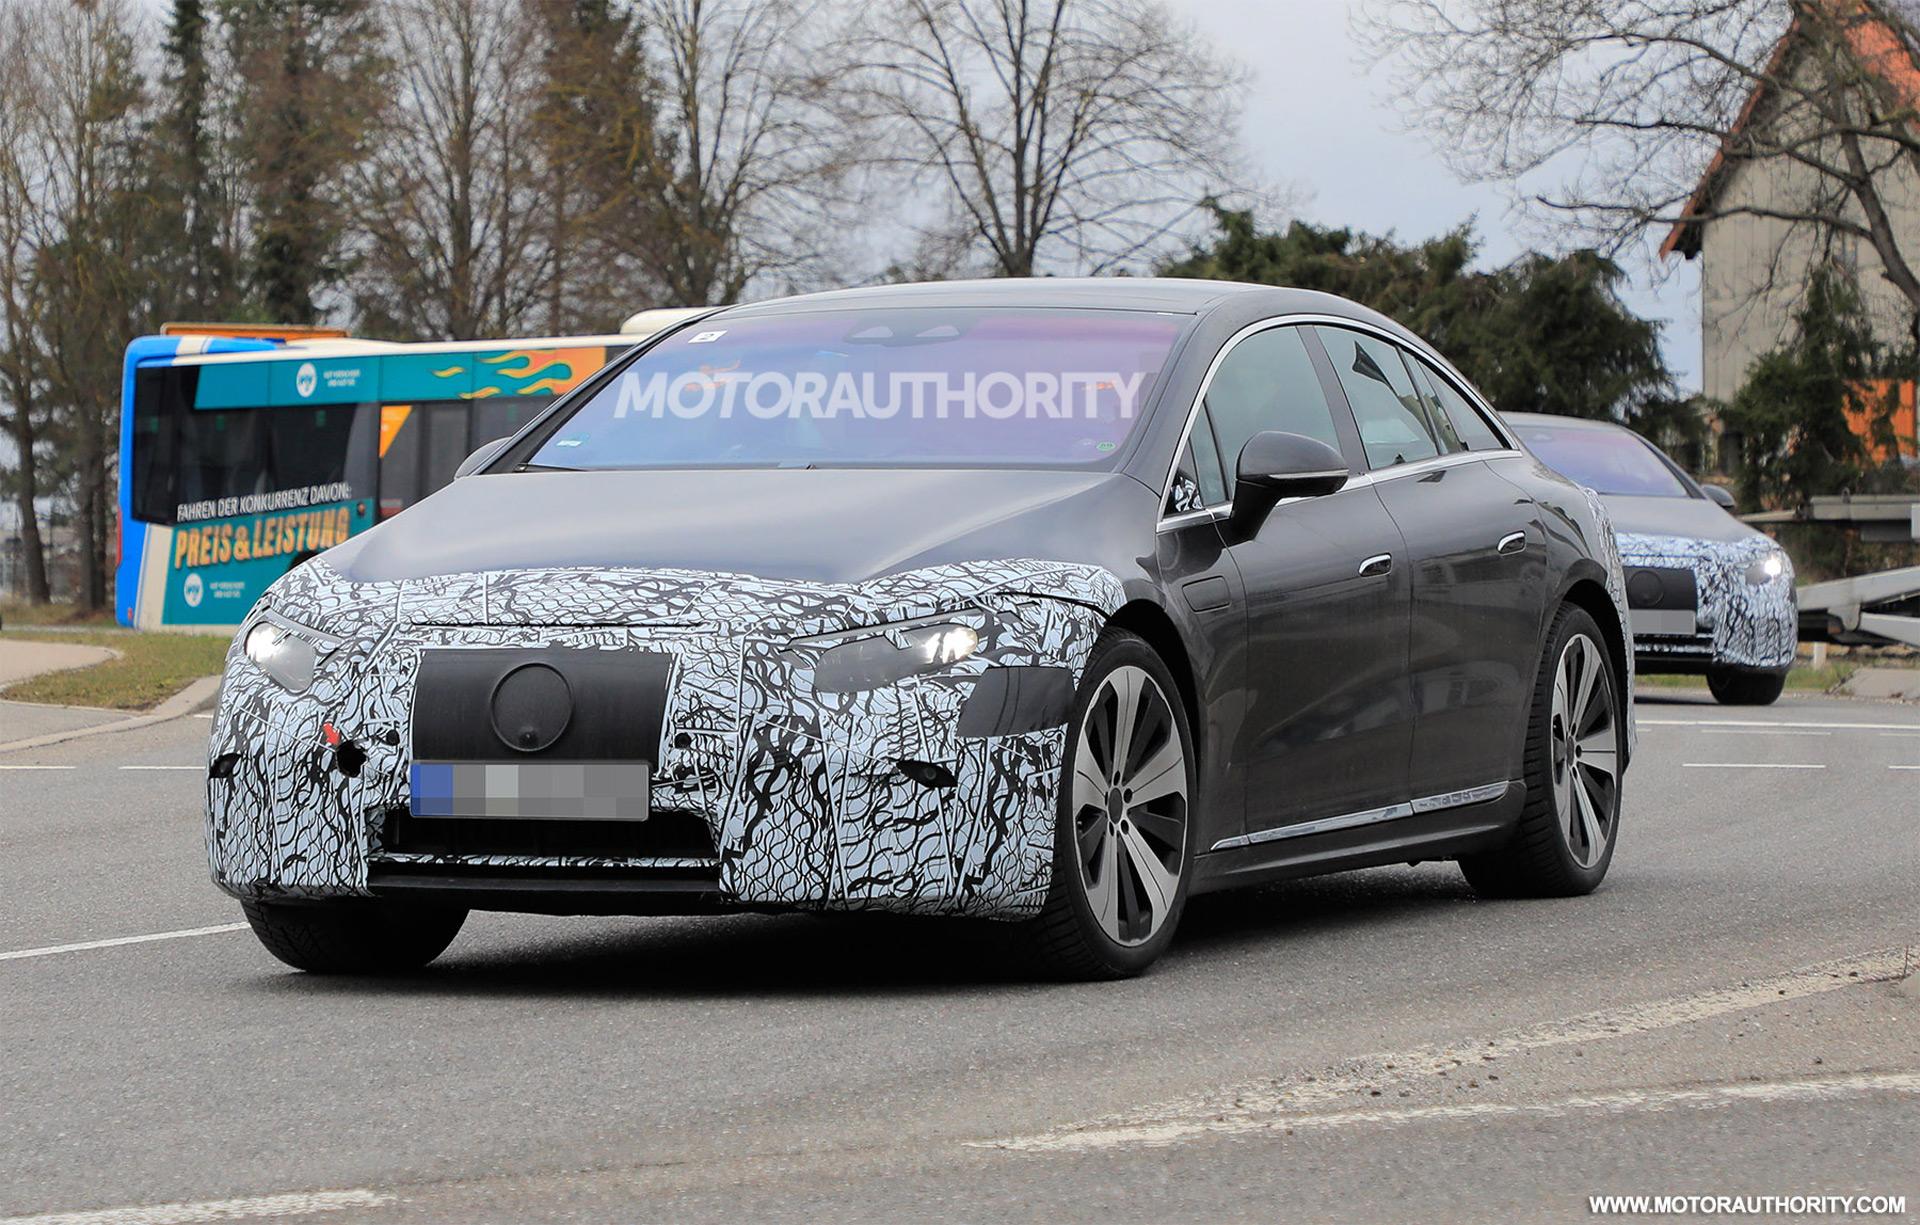 2022 Mercedes-Benz EQS spy shots: Electric sedan sheds camo ahead of Apr. 15 reveal